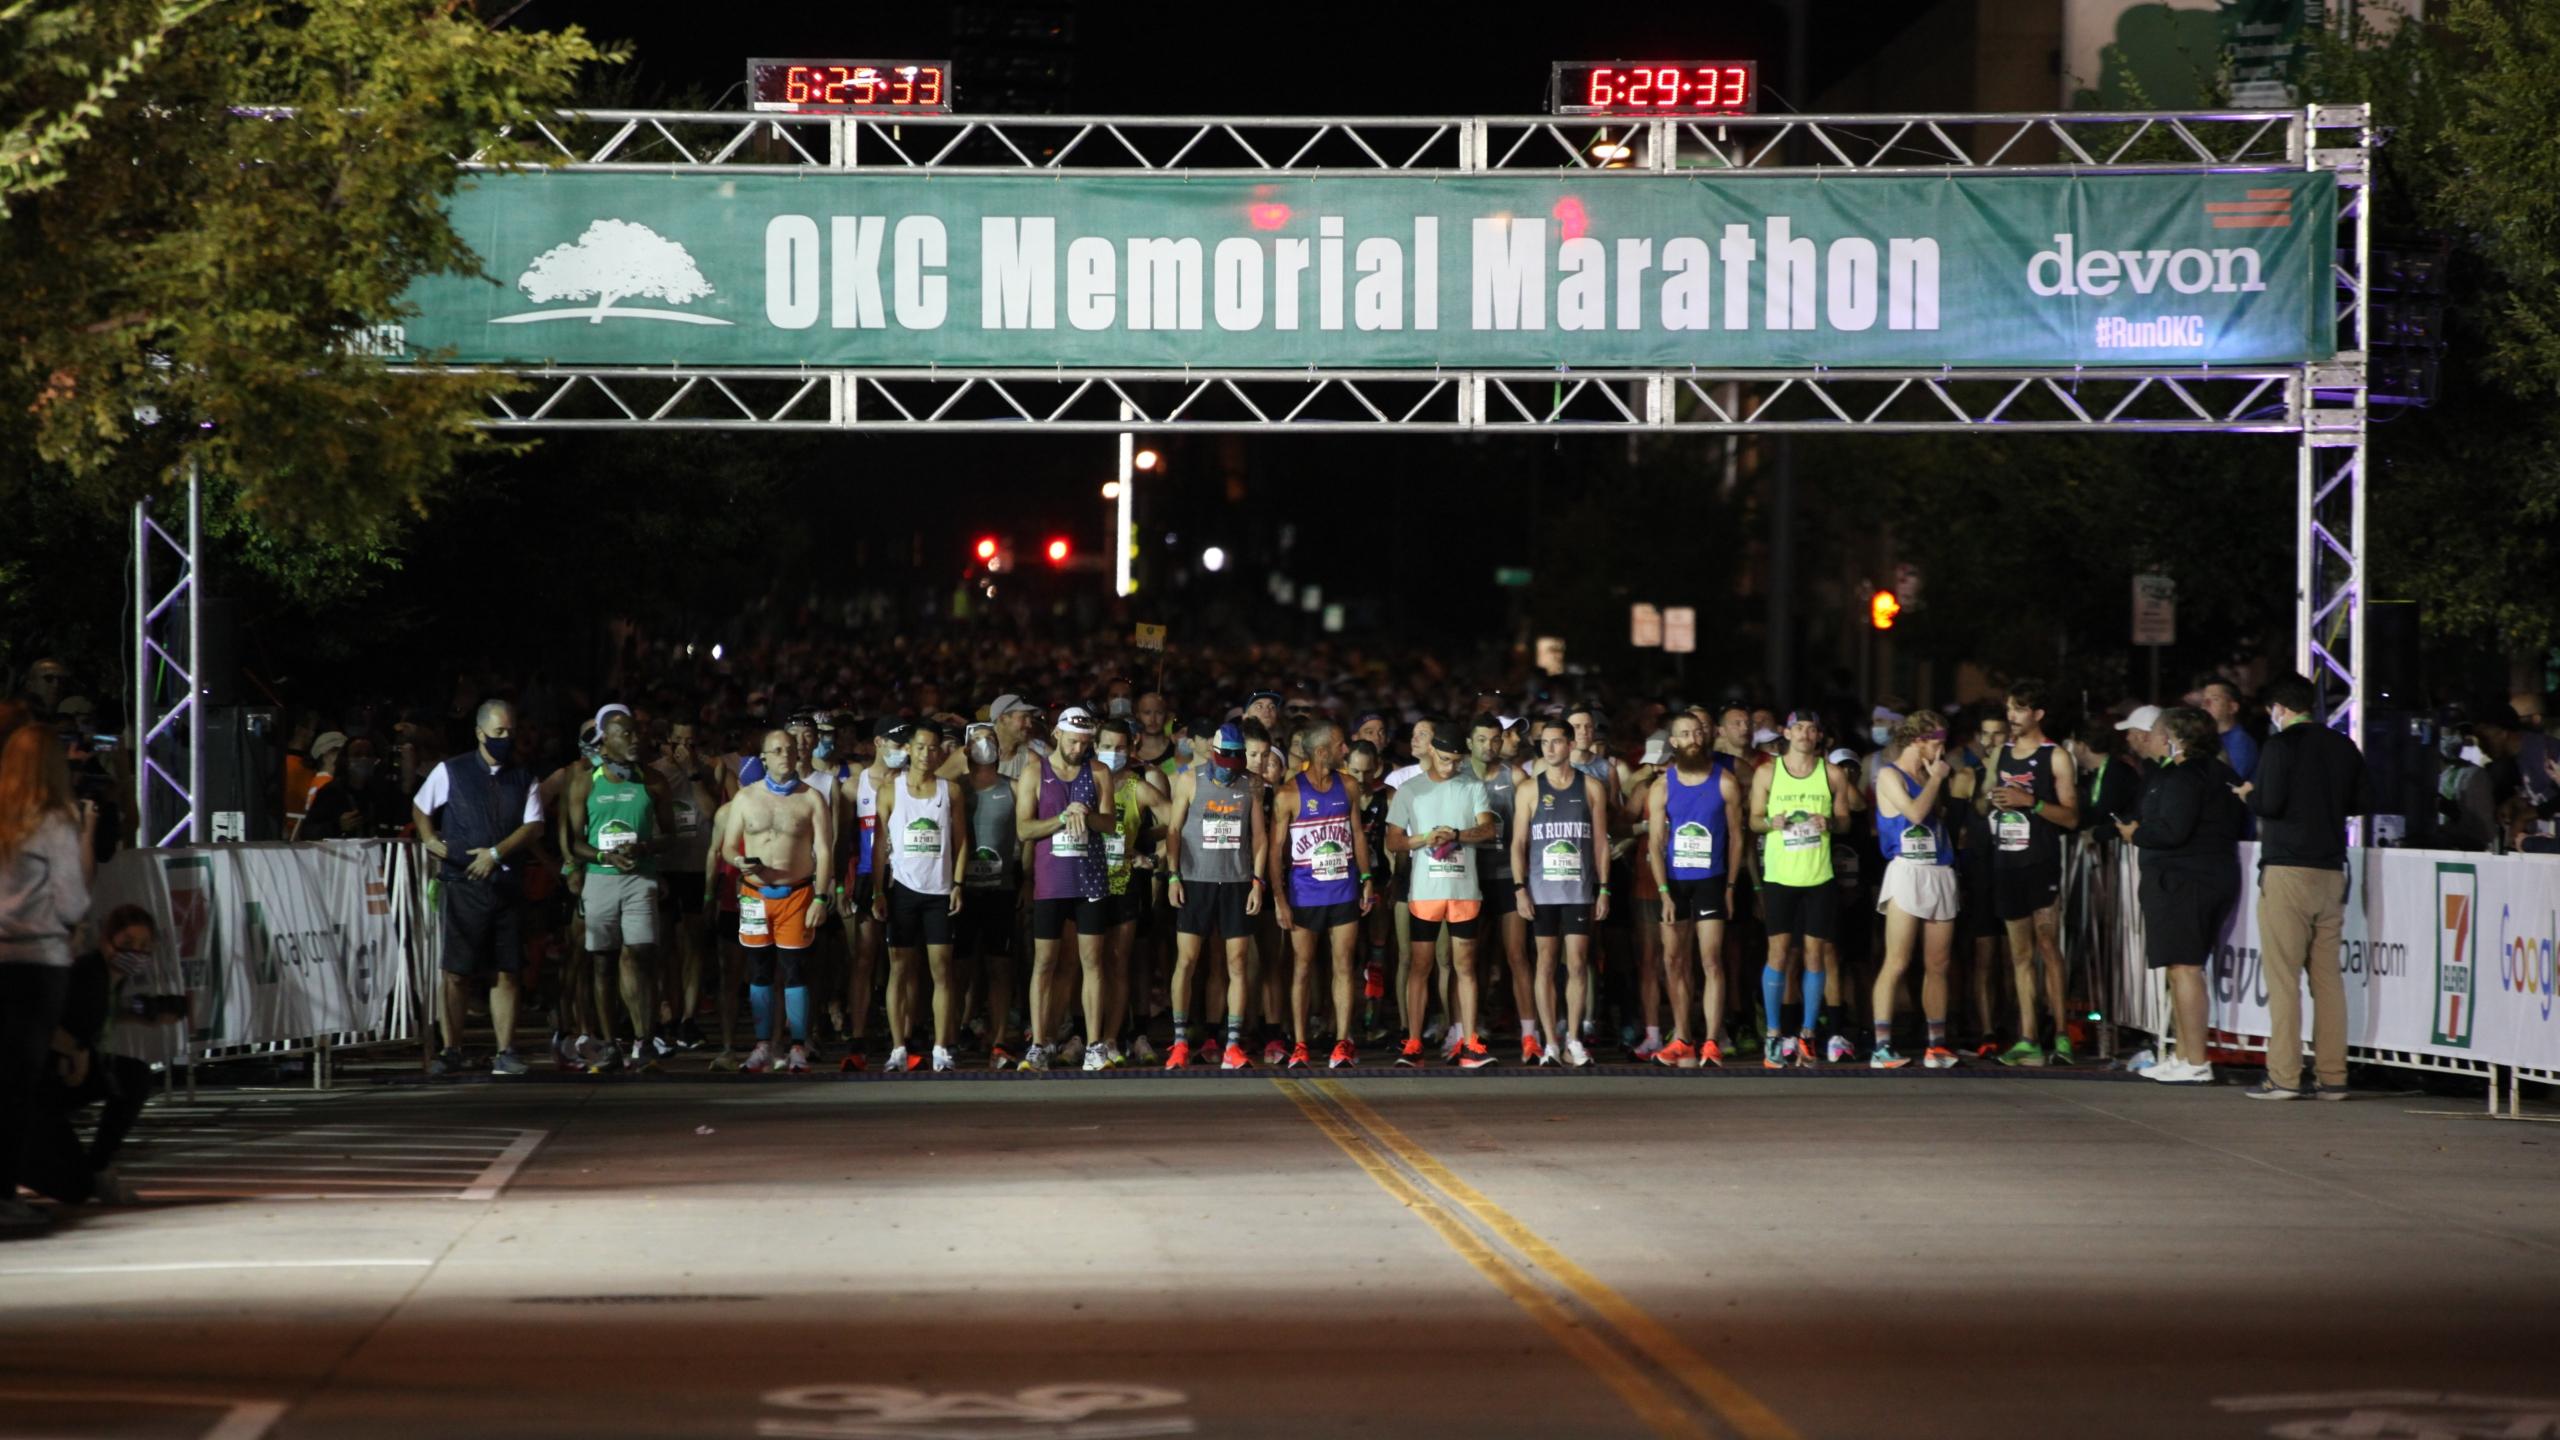 Start line of the Oklahoma City Memorial Marathon 2021